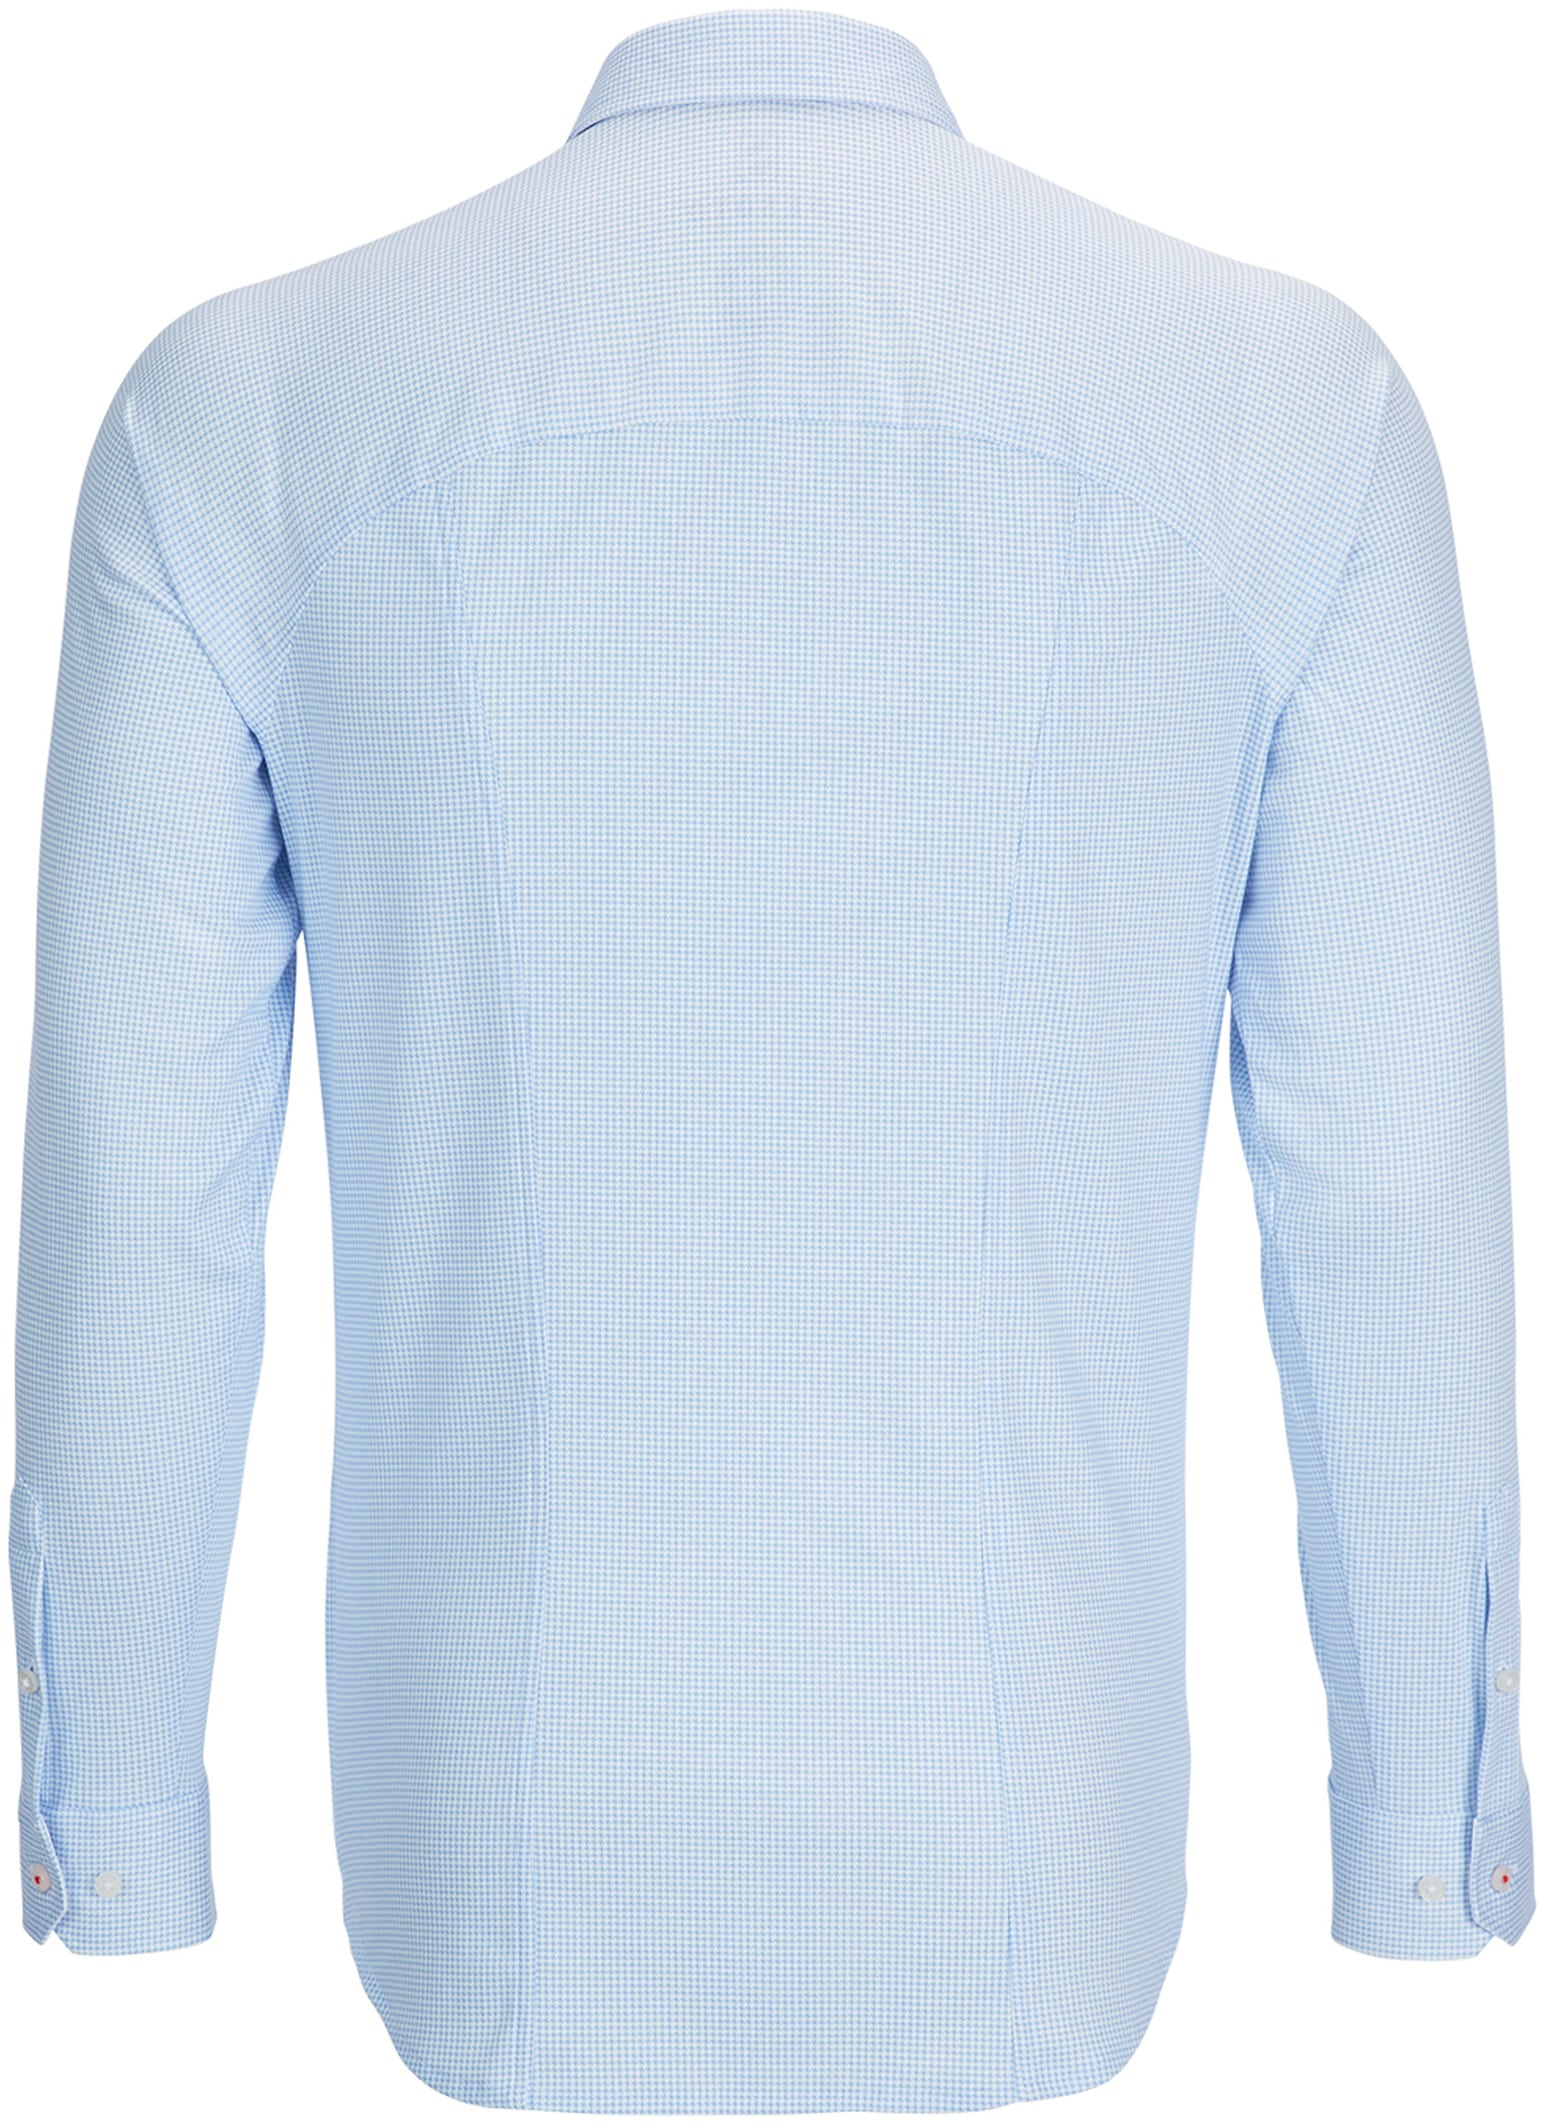 Desoto Overhemd Strijkvrij PDP Blauw foto 1